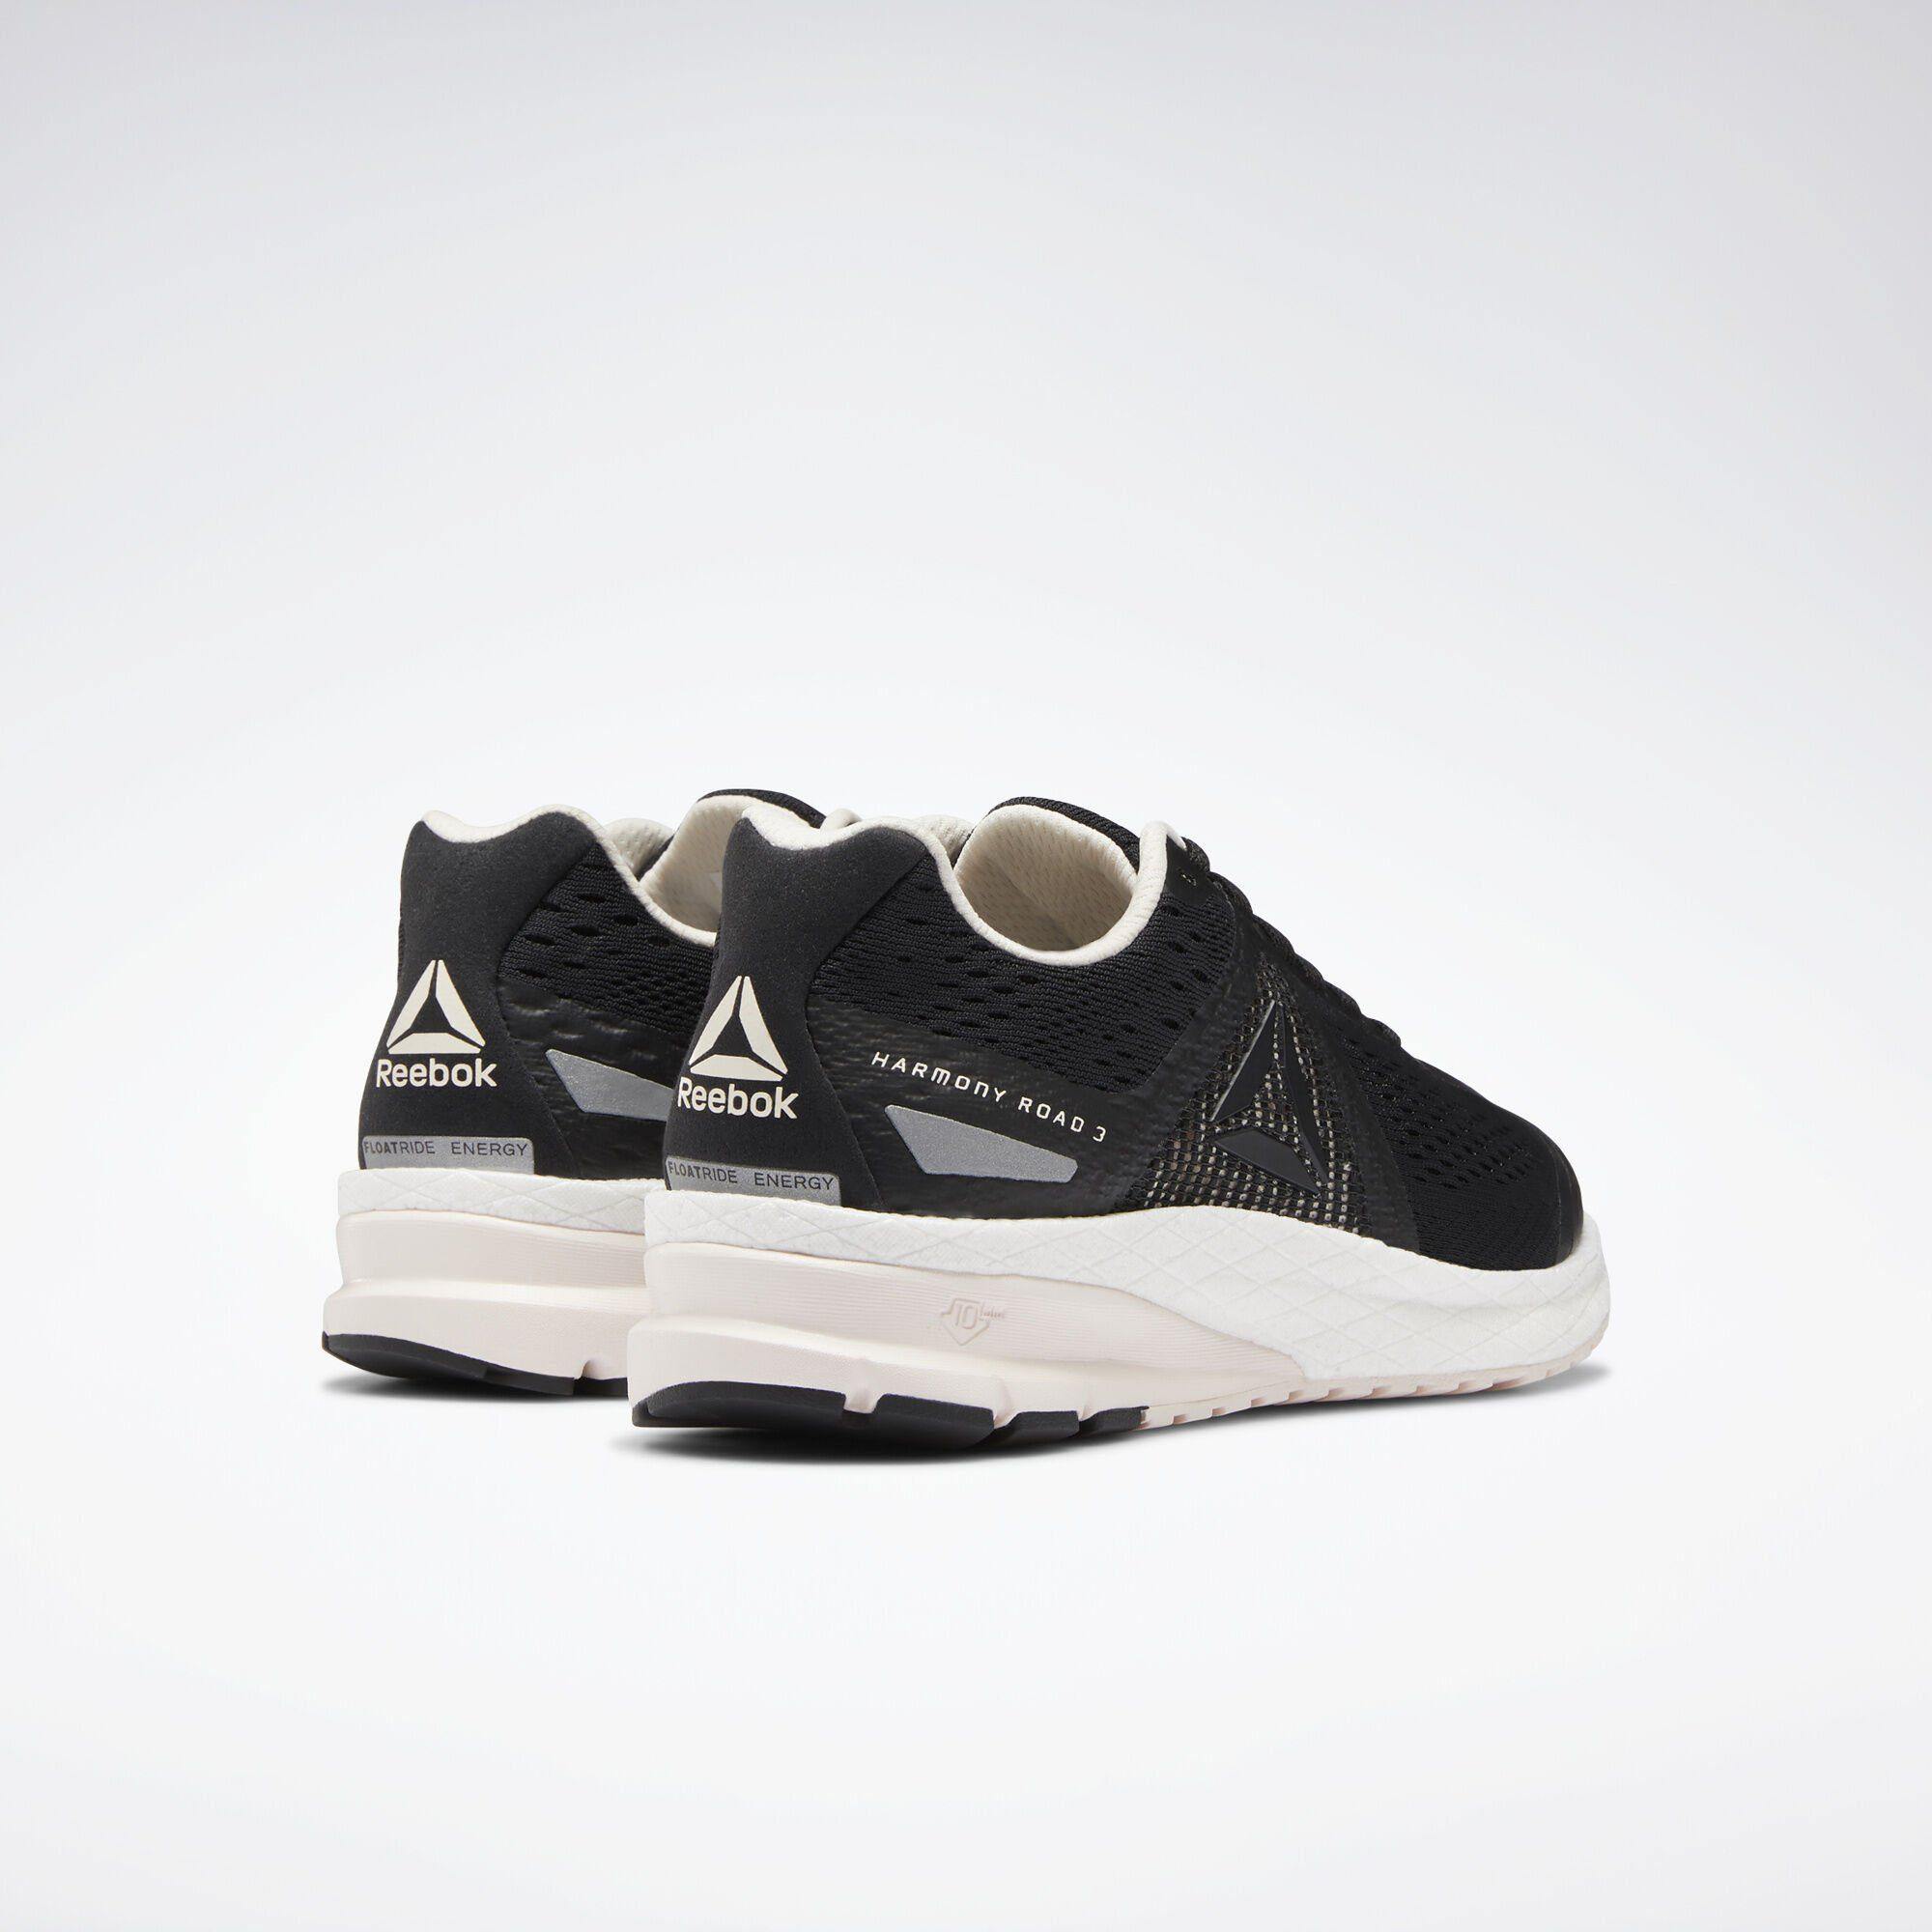 Reebok Trainingsschuh Online Harmony Road 0 Shoes« »reebok 3 Kaufen dQrCsht